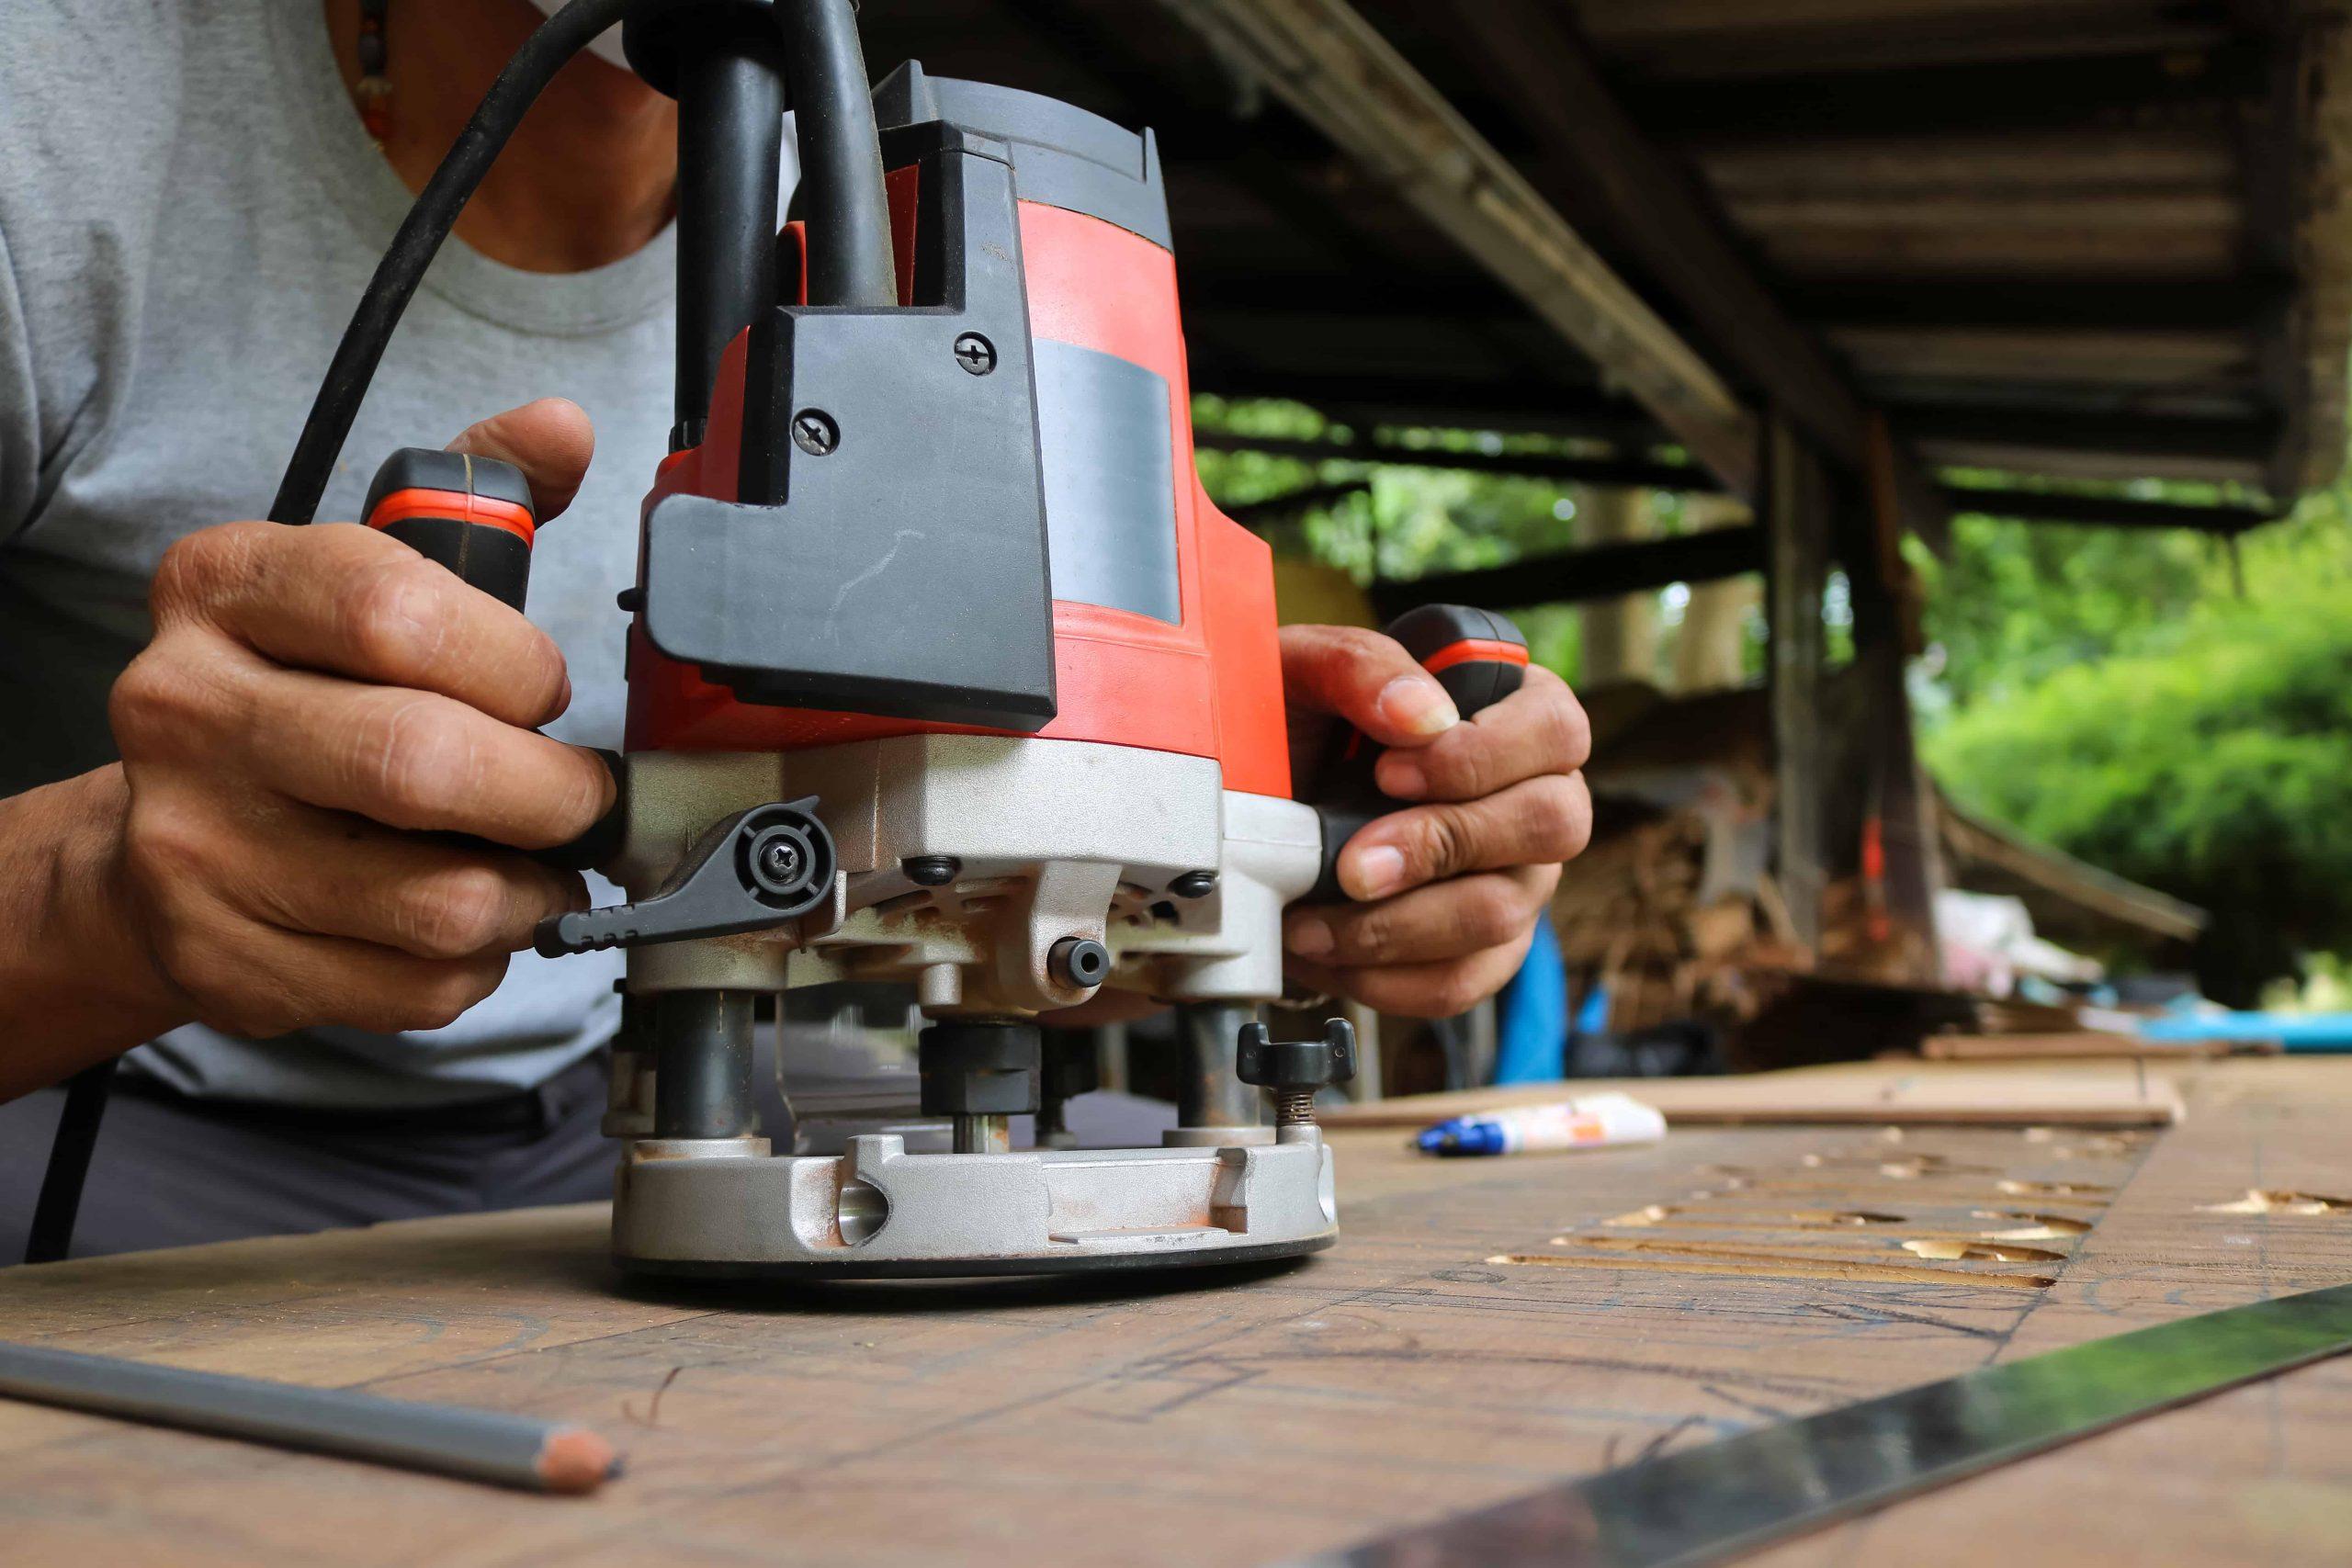 Fresadora de madera: ¿Cuál es la mejor del 2020?